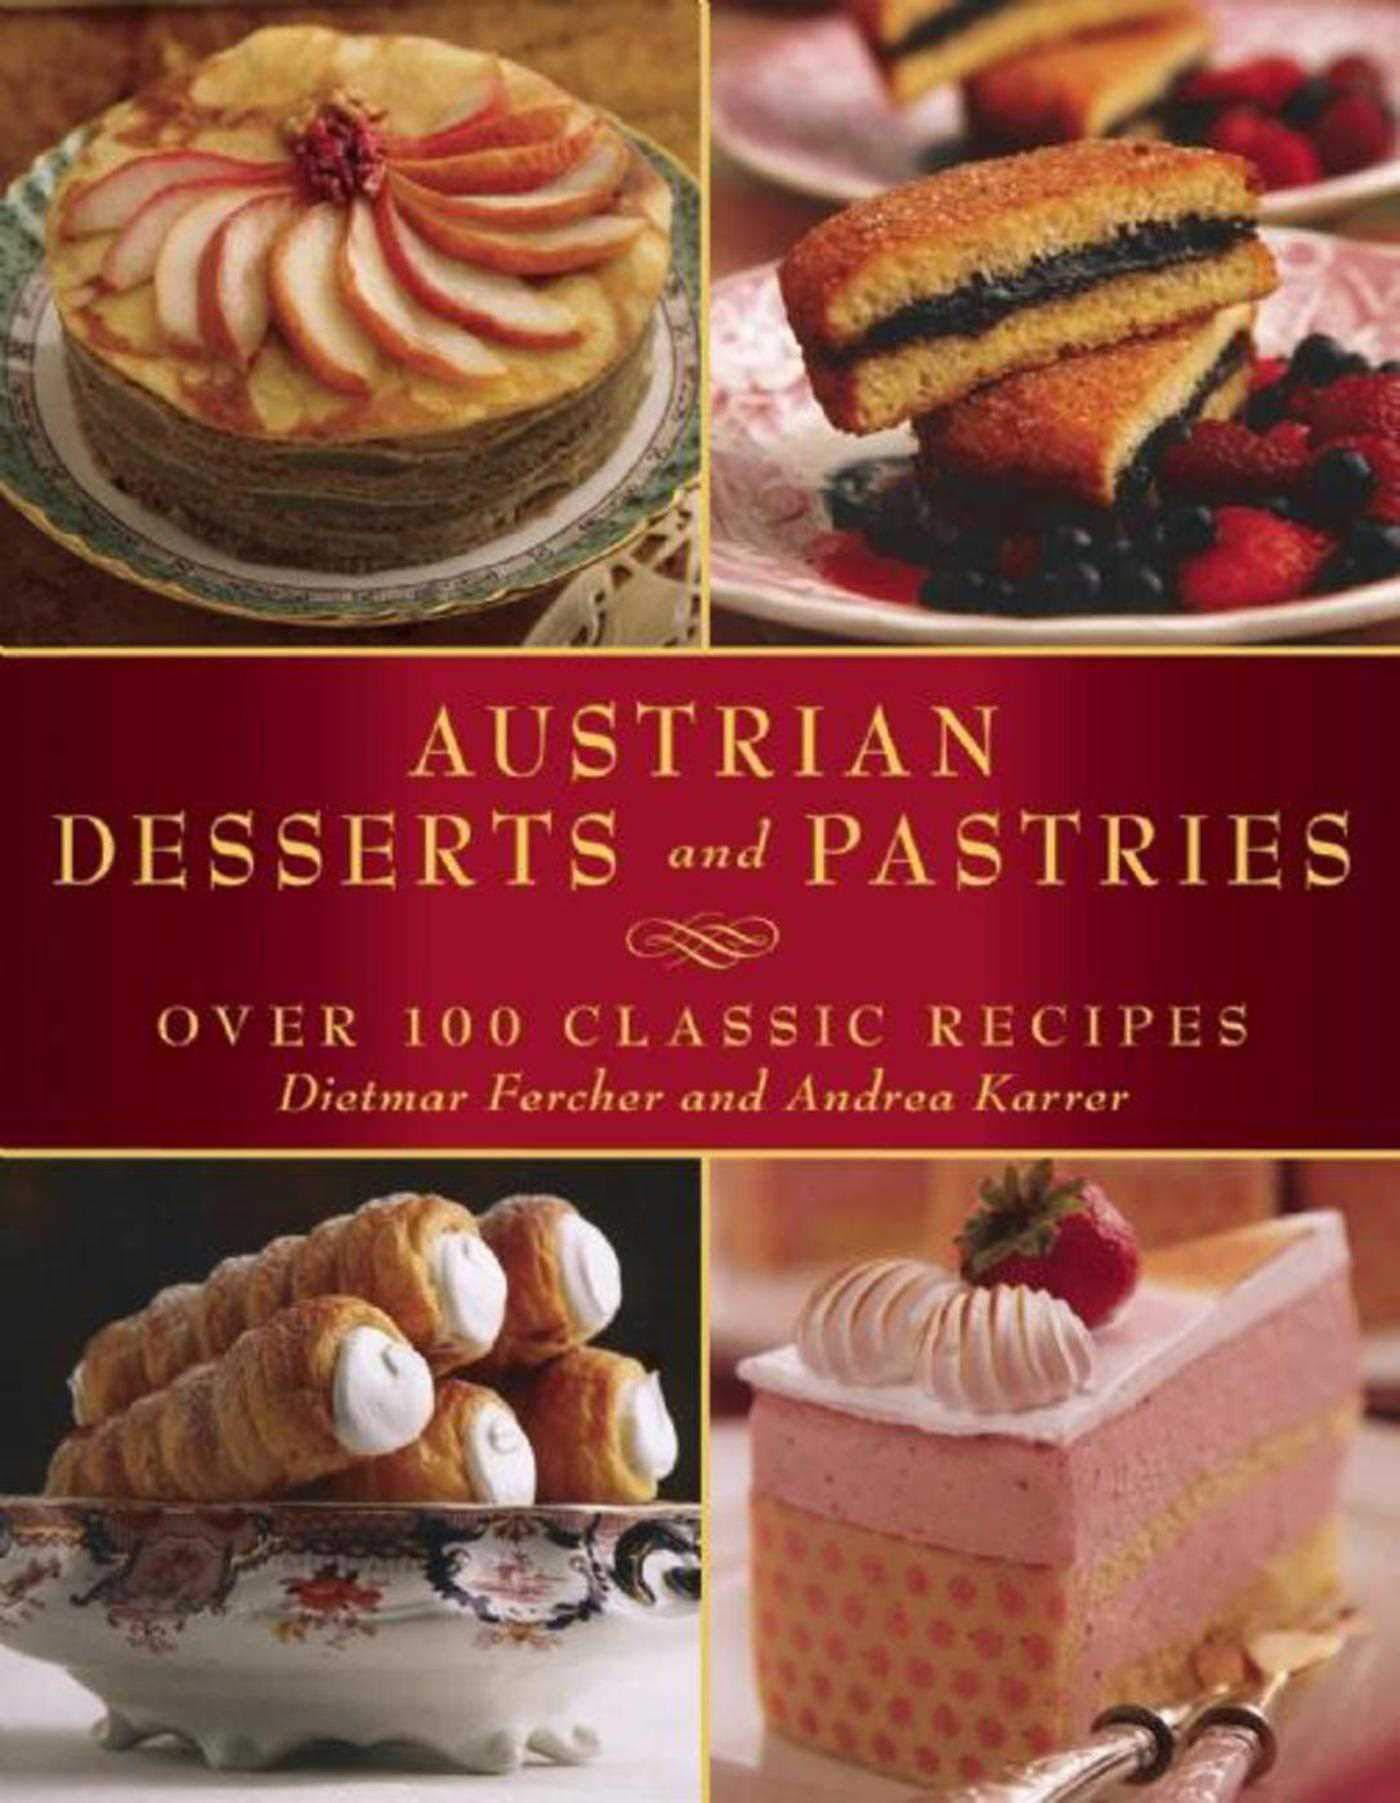 Classic Recipes: Delectable Desserts